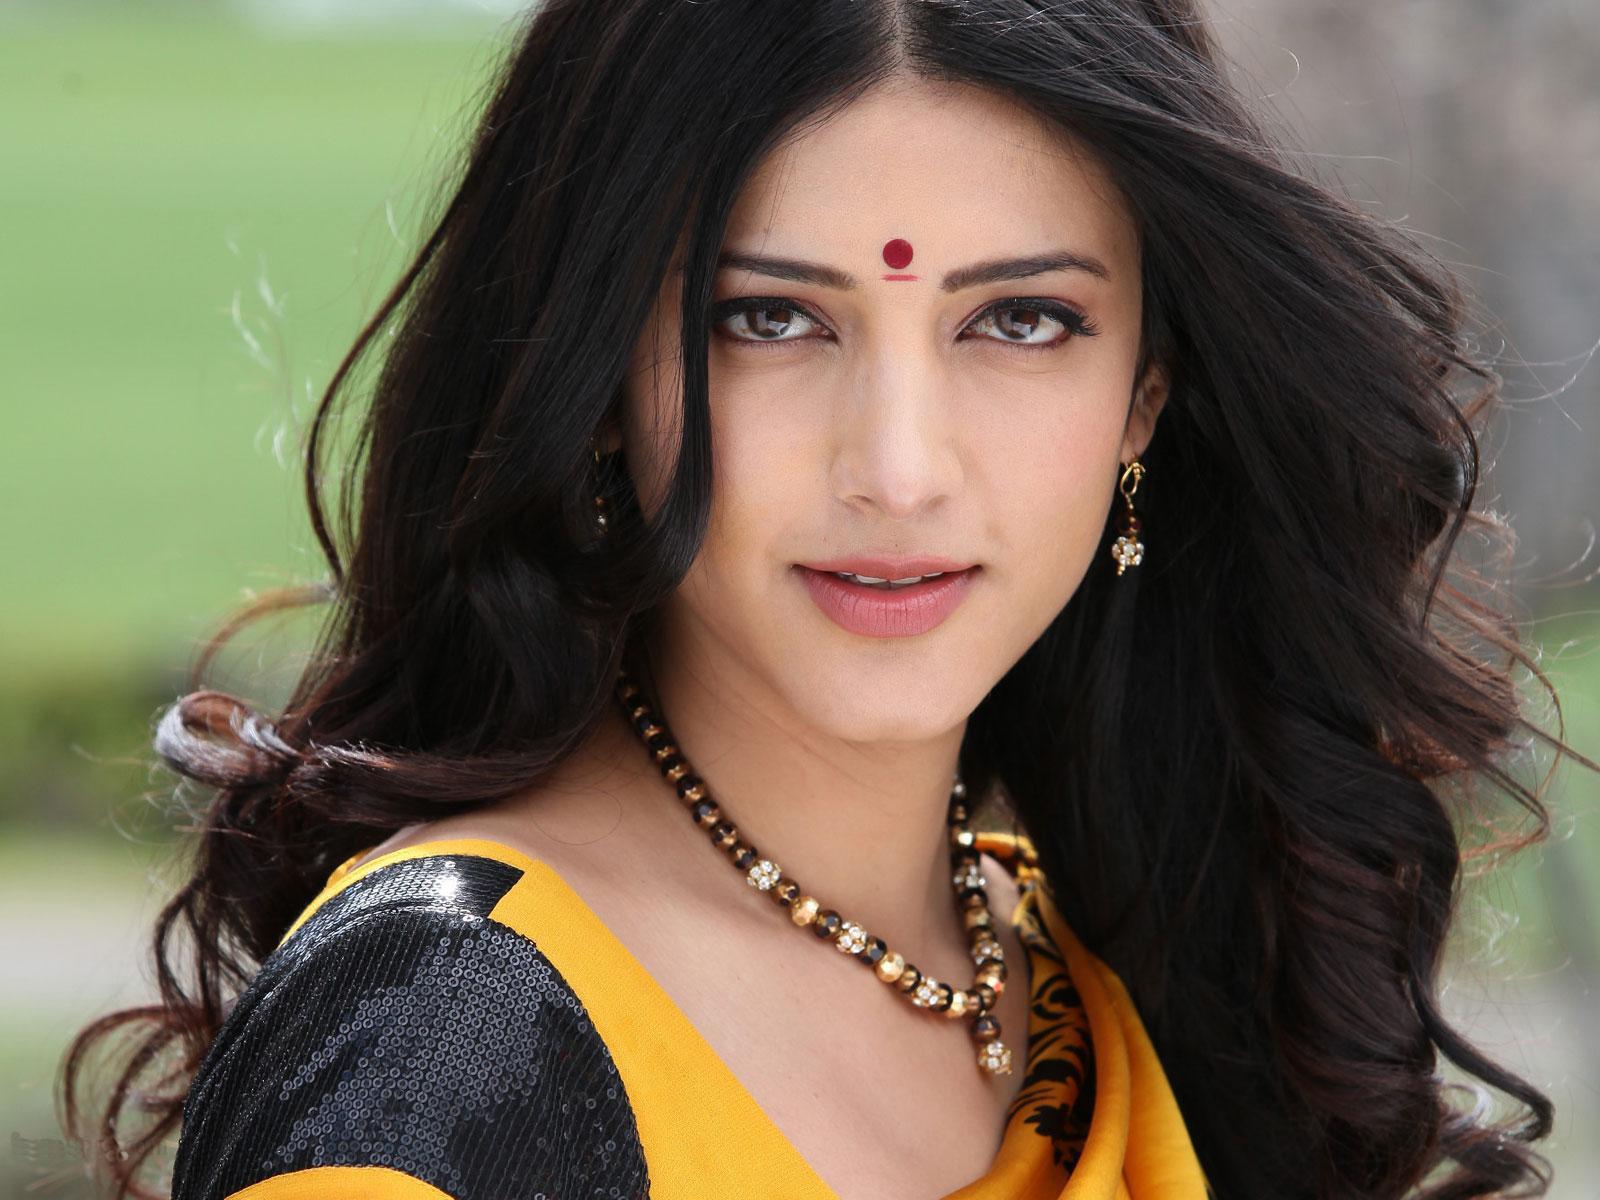 Hd Wallpaper Tamil Actress Wallpaper Download  accomodations a